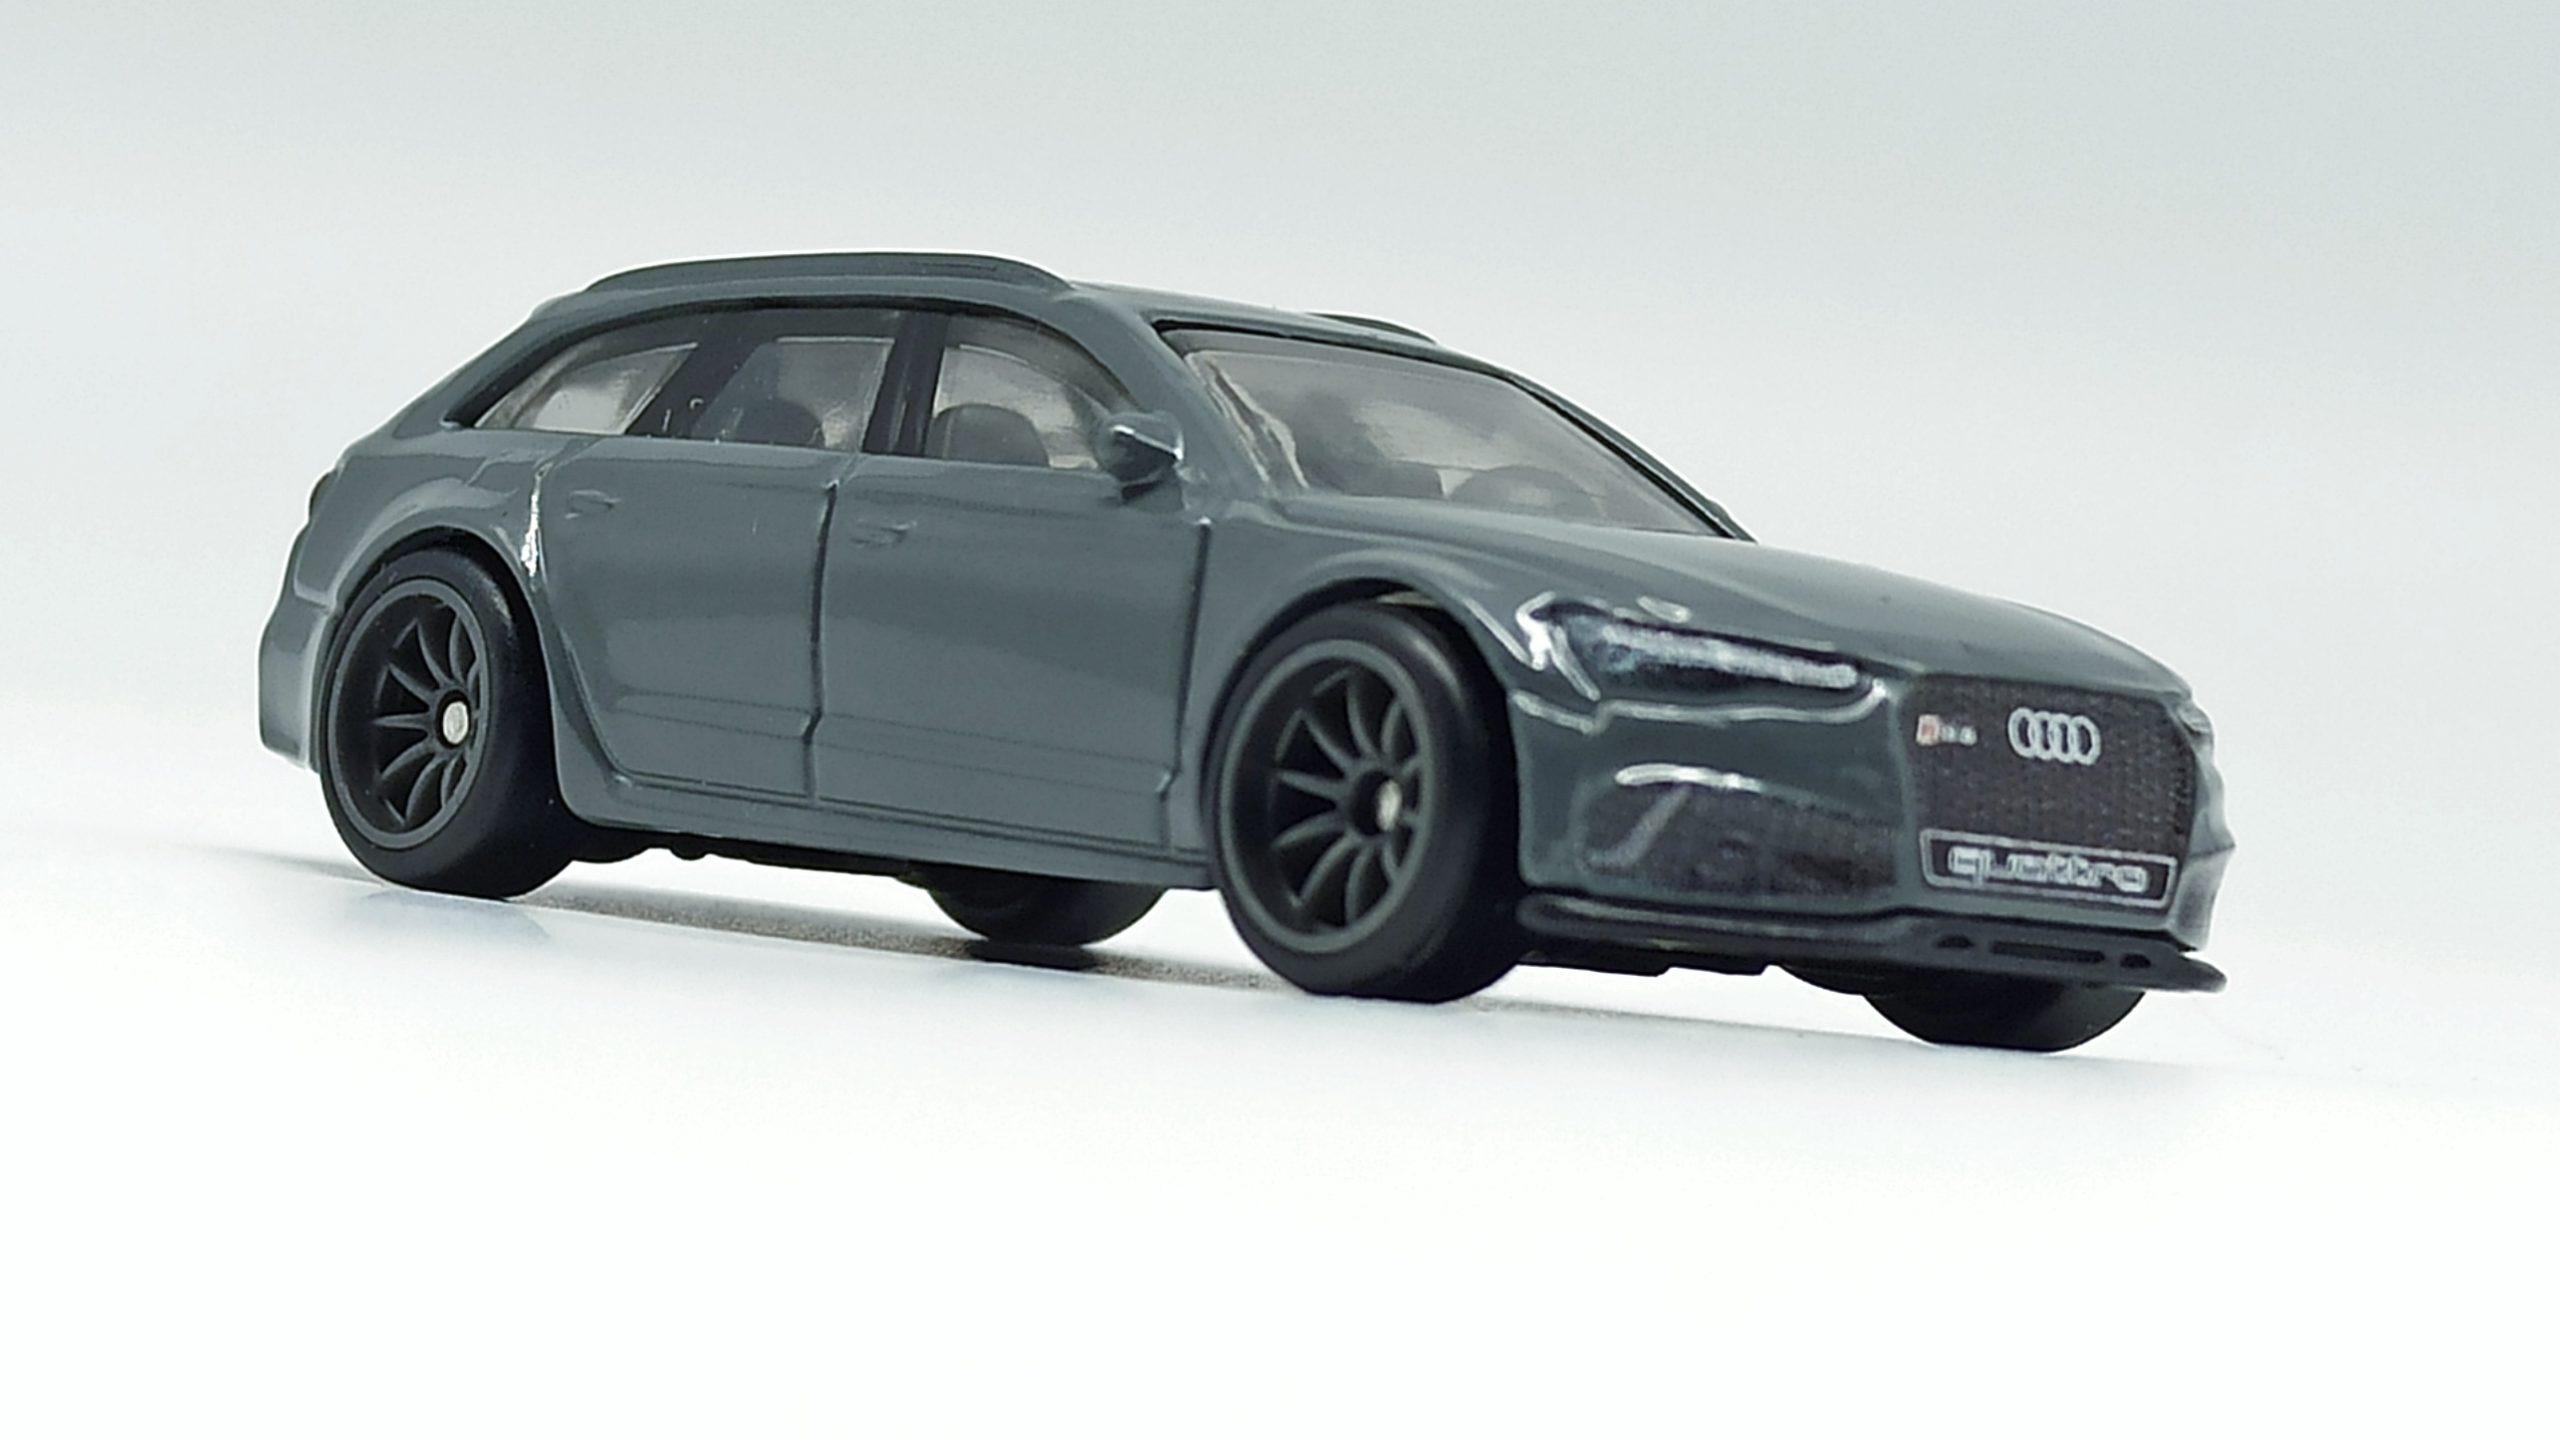 Hot Wheels '17 Audi RS 6 Avant (GRJ65) 2021 Car Culture: Fast Wagons (5/5) grey front angle